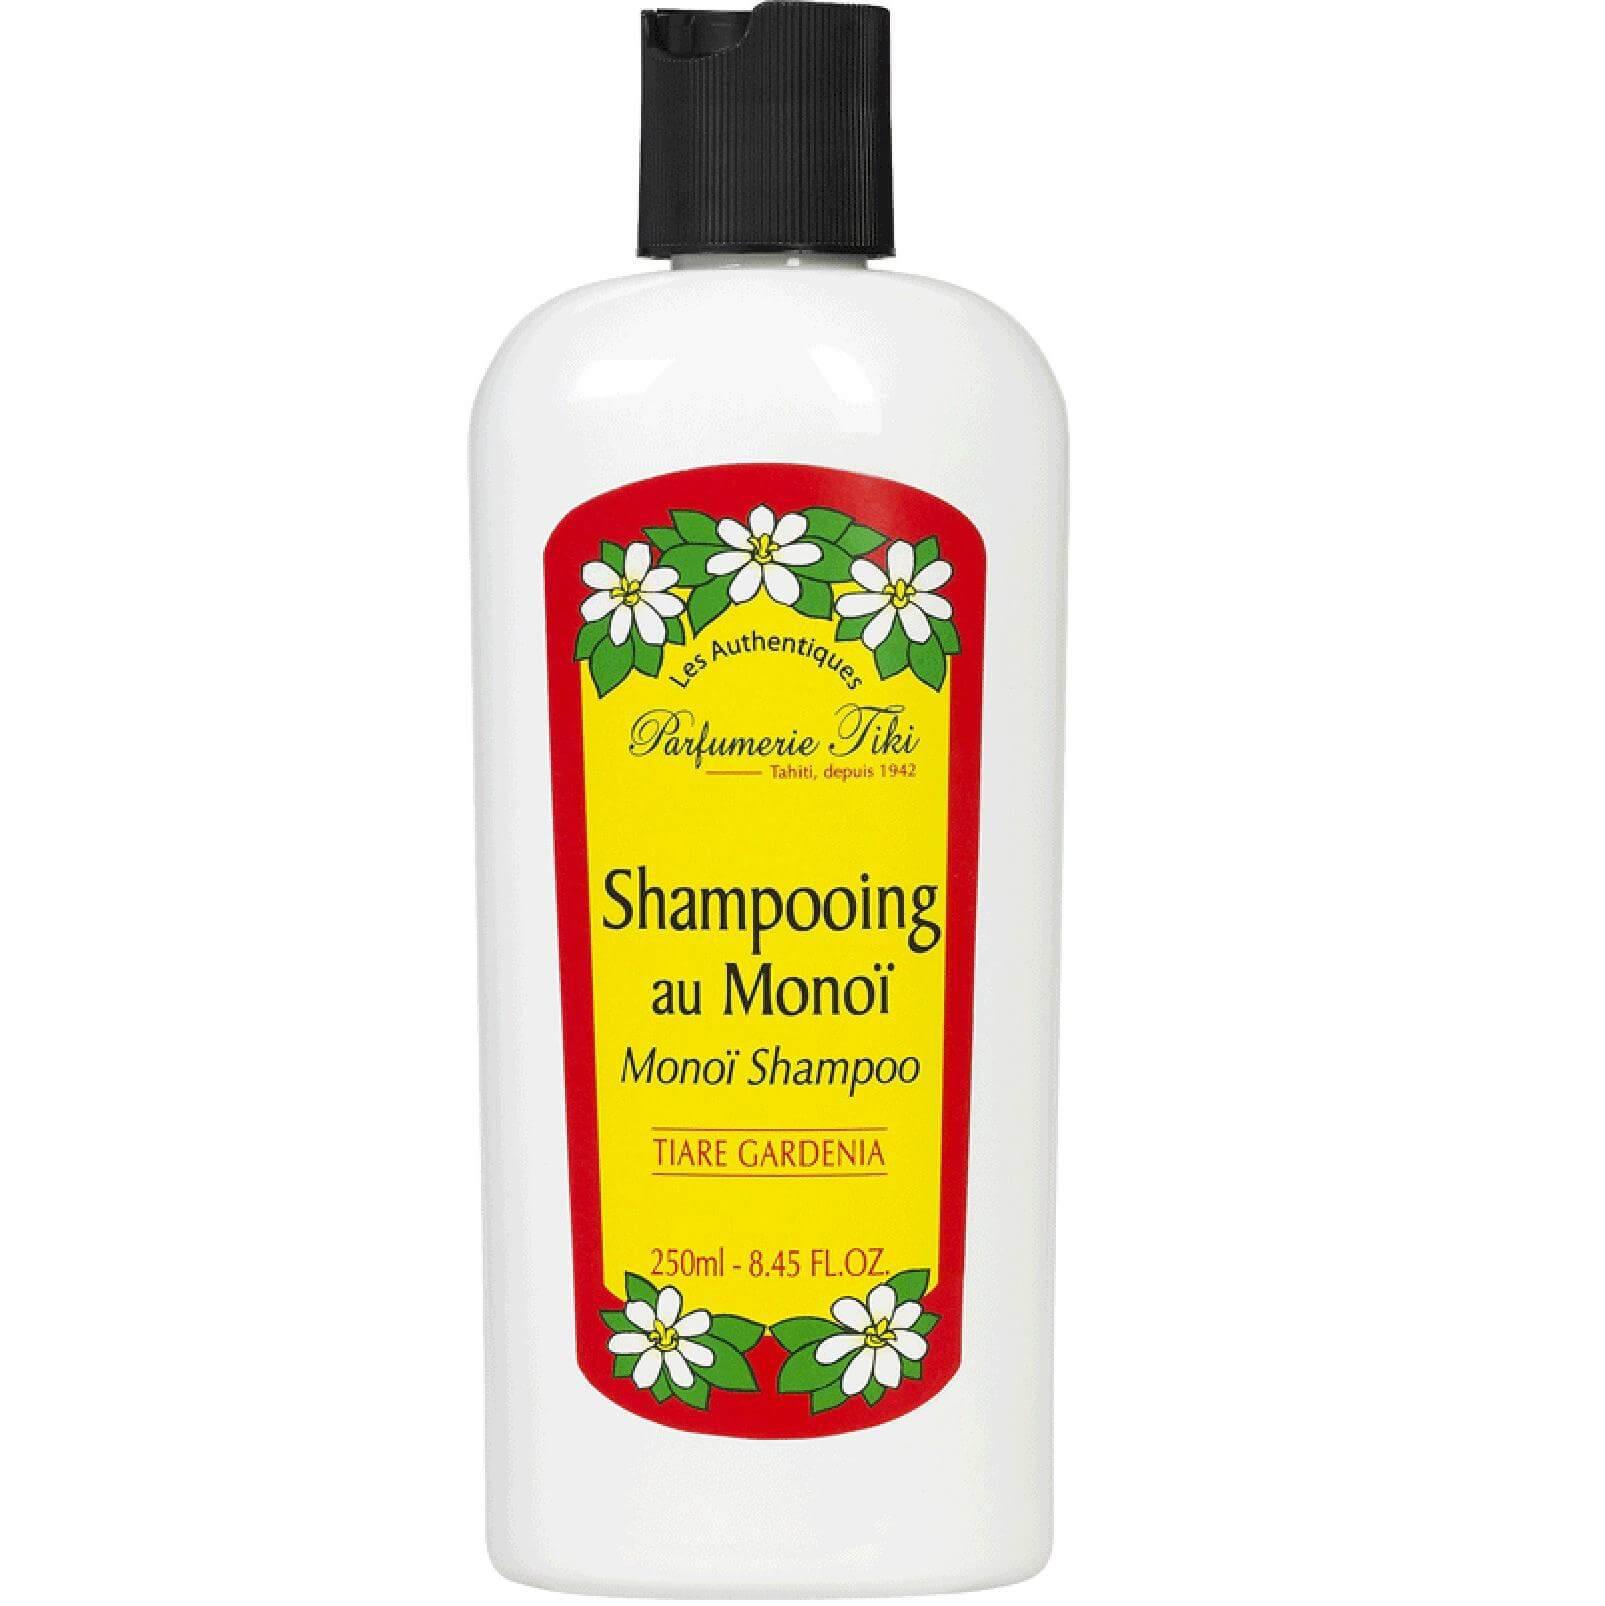 Monoi TikiShampooing Au Monoi Tiare Σαμπουάν για Ξηρά/Κατεστραμμένα Μαλλιάμε Άρωμα Γαρδένιας 250ml